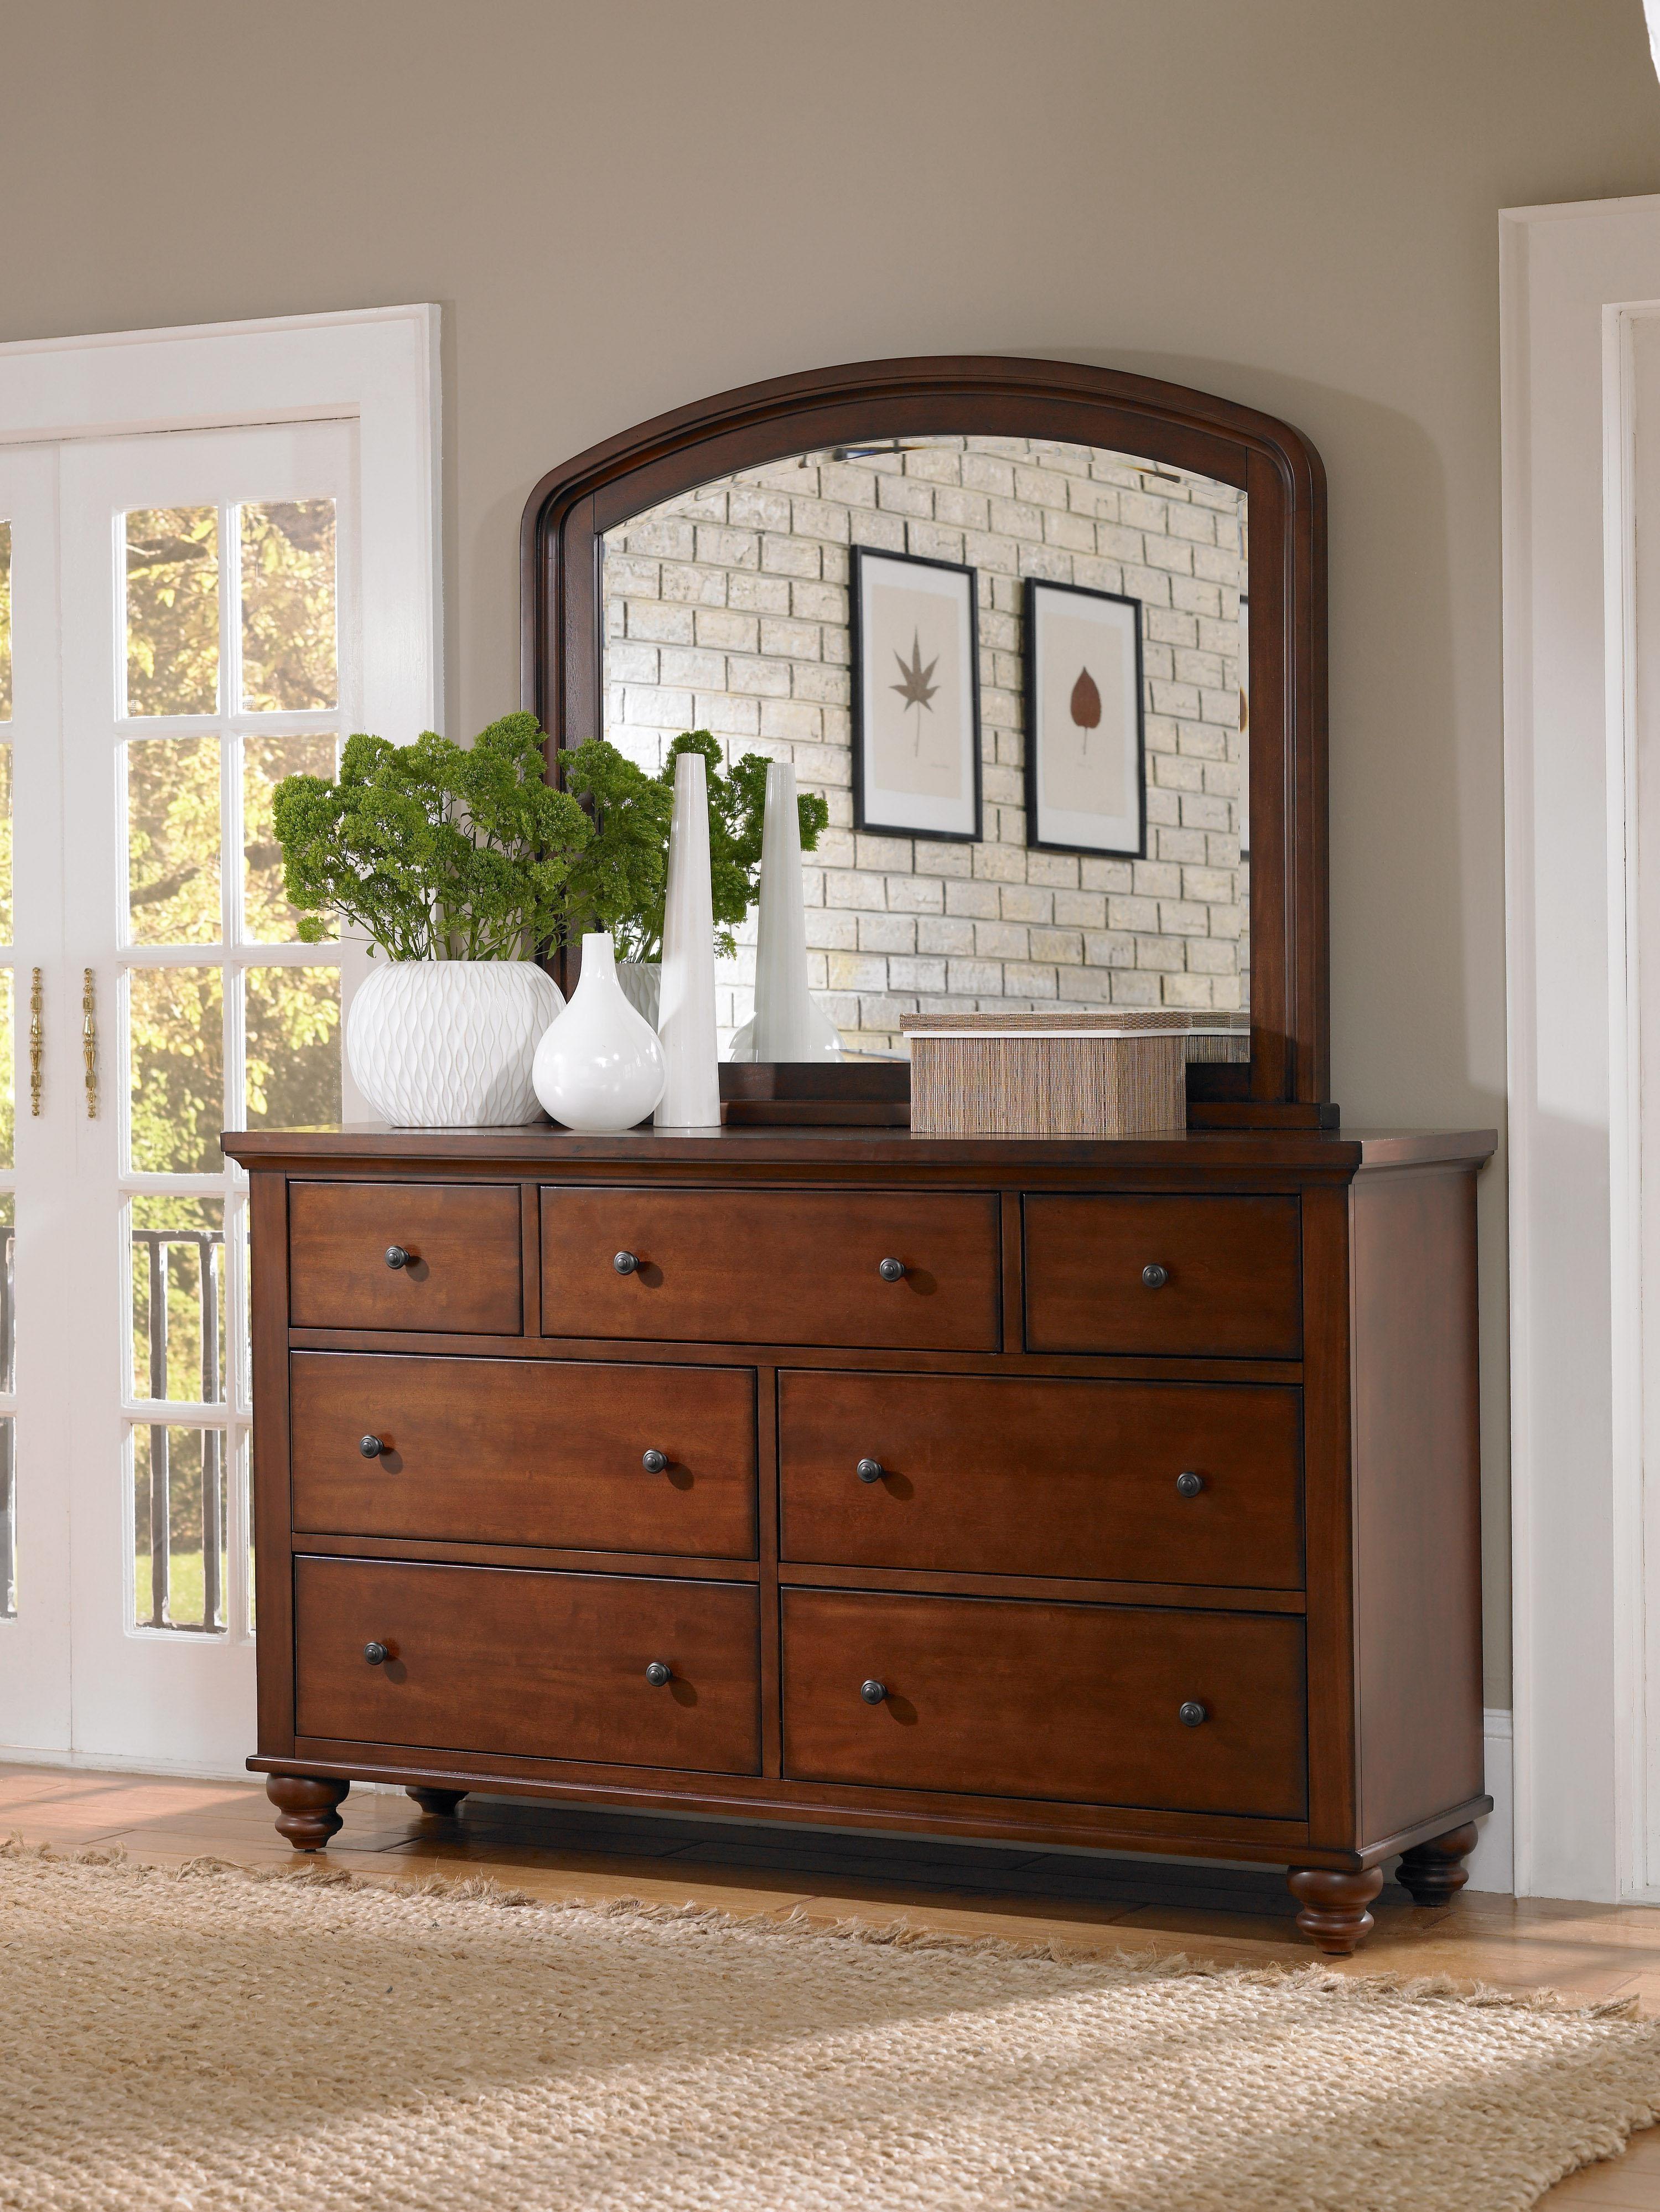 Aspenhome Furniture Cambridge Double Dresser ICB 454 BCH 4